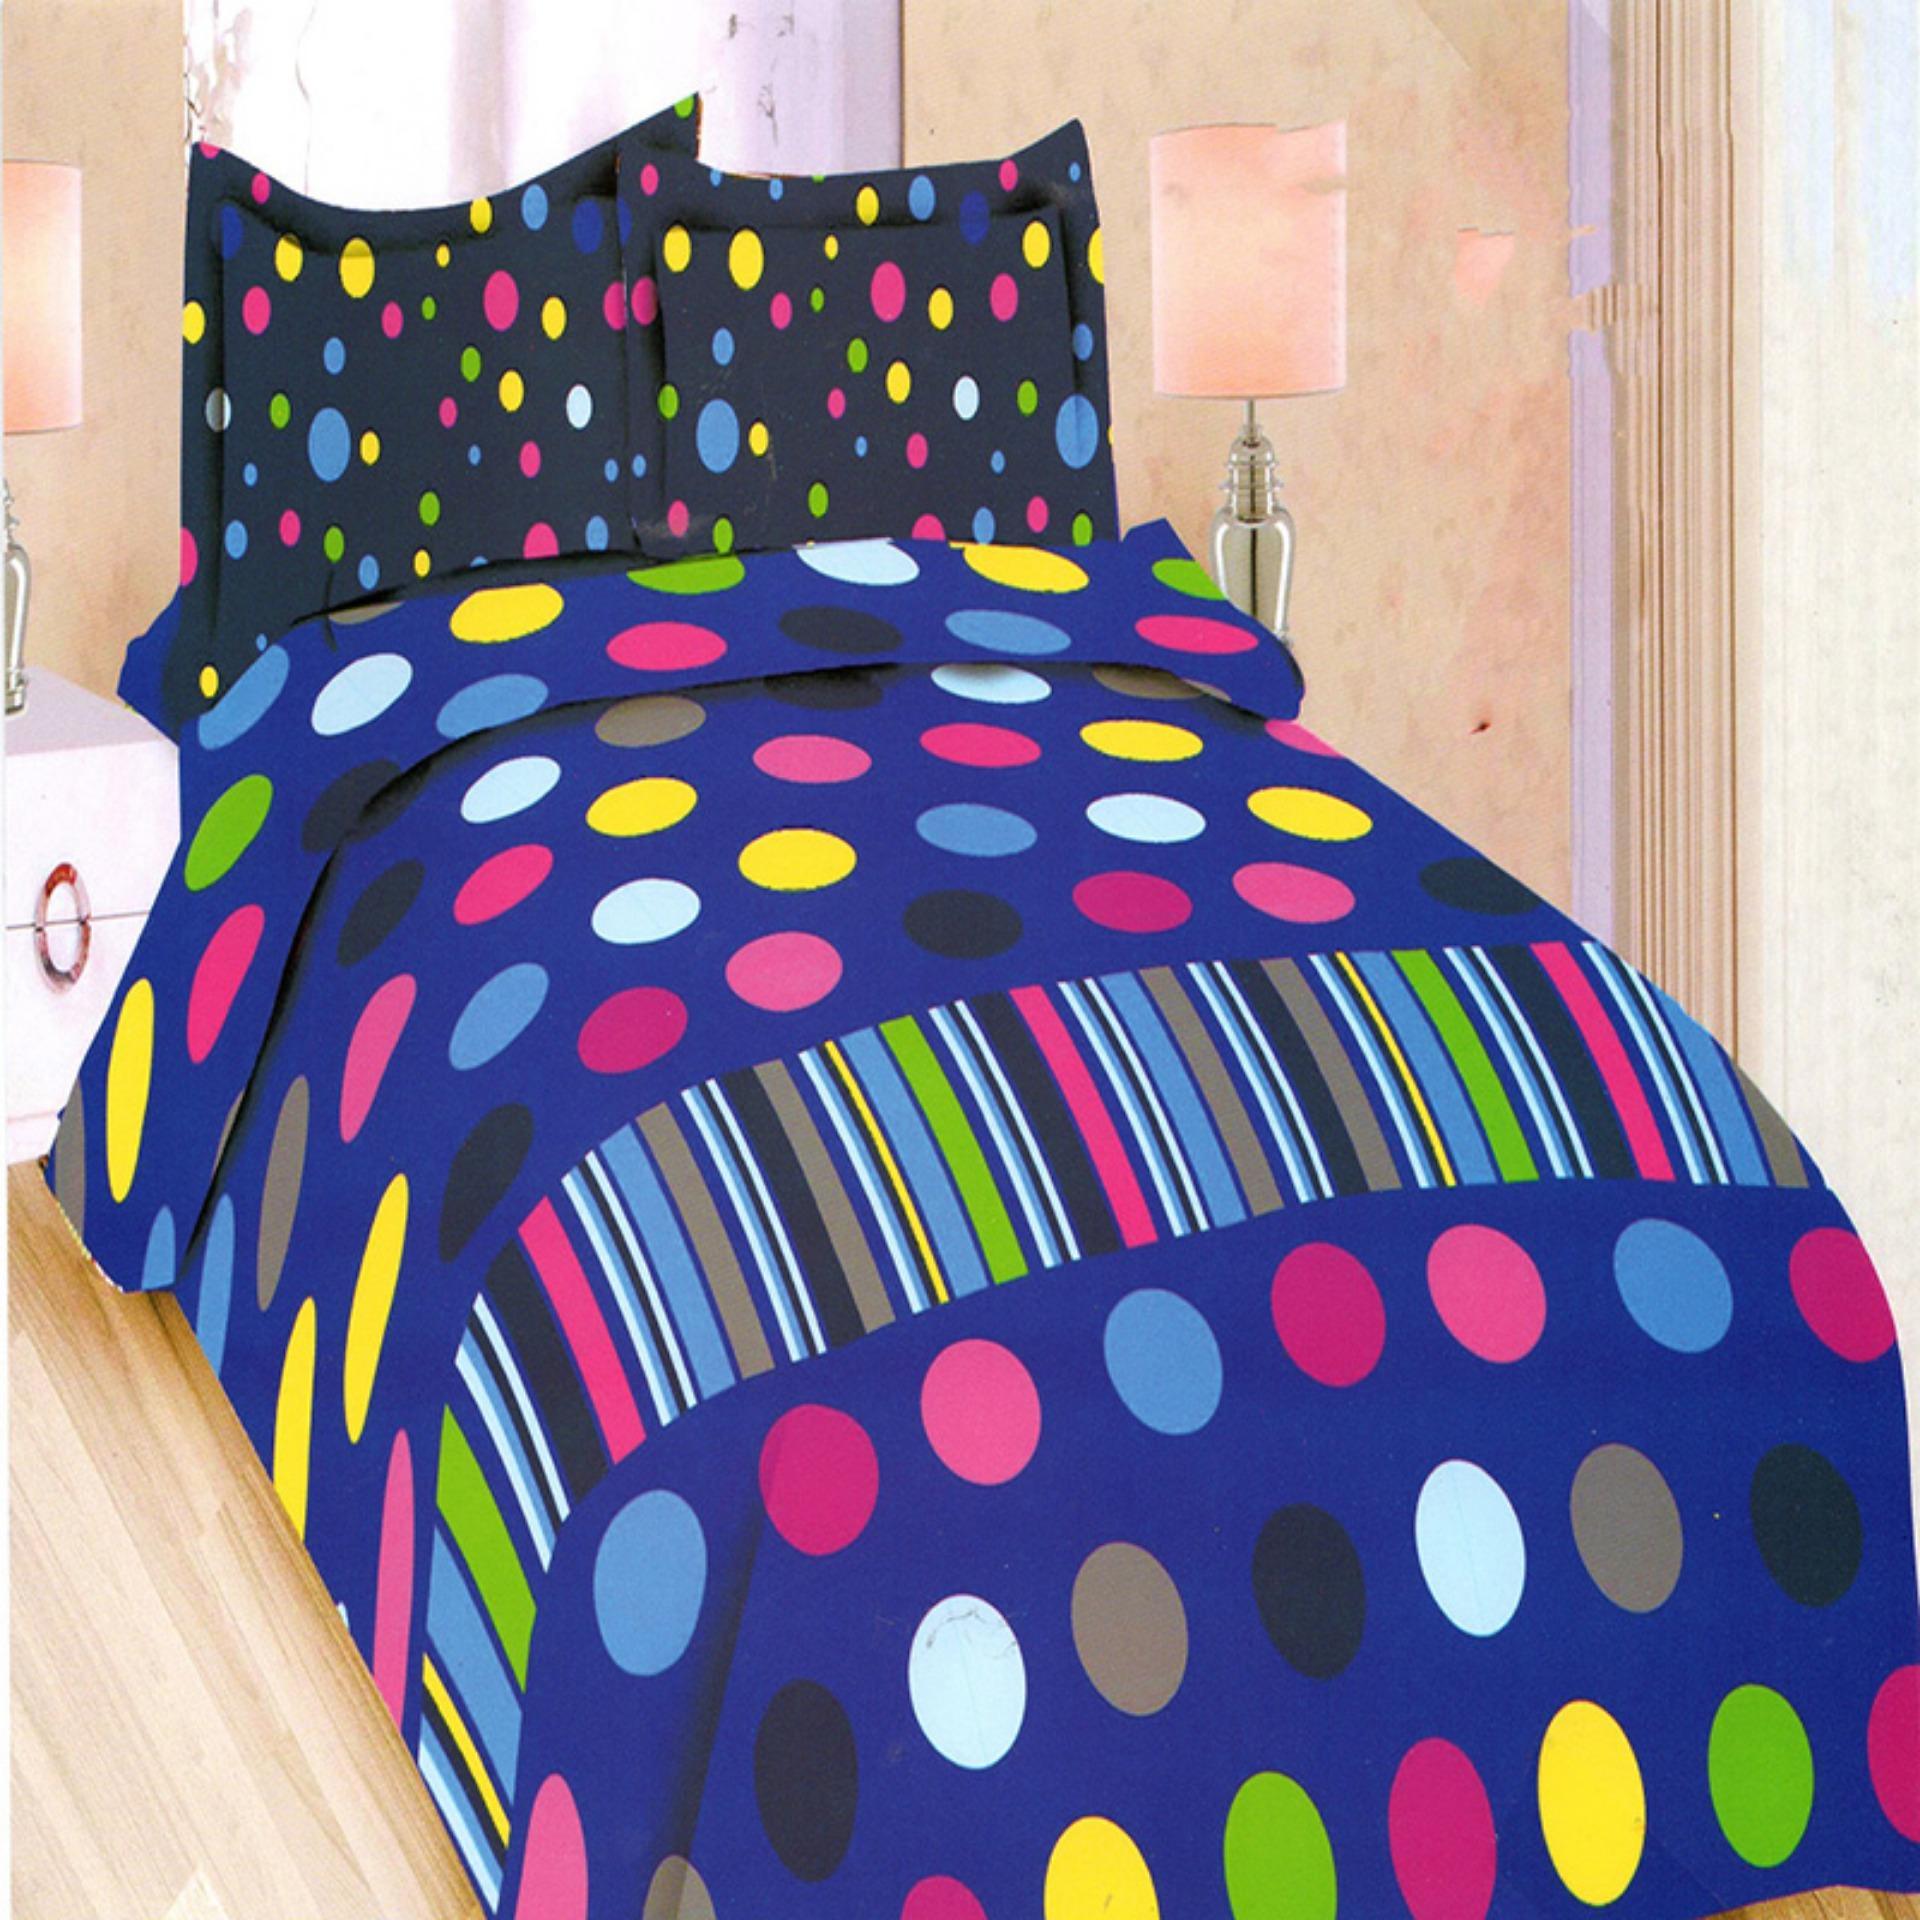 Bonita Bedcover King 3D Motif Everbest 180x200 cm